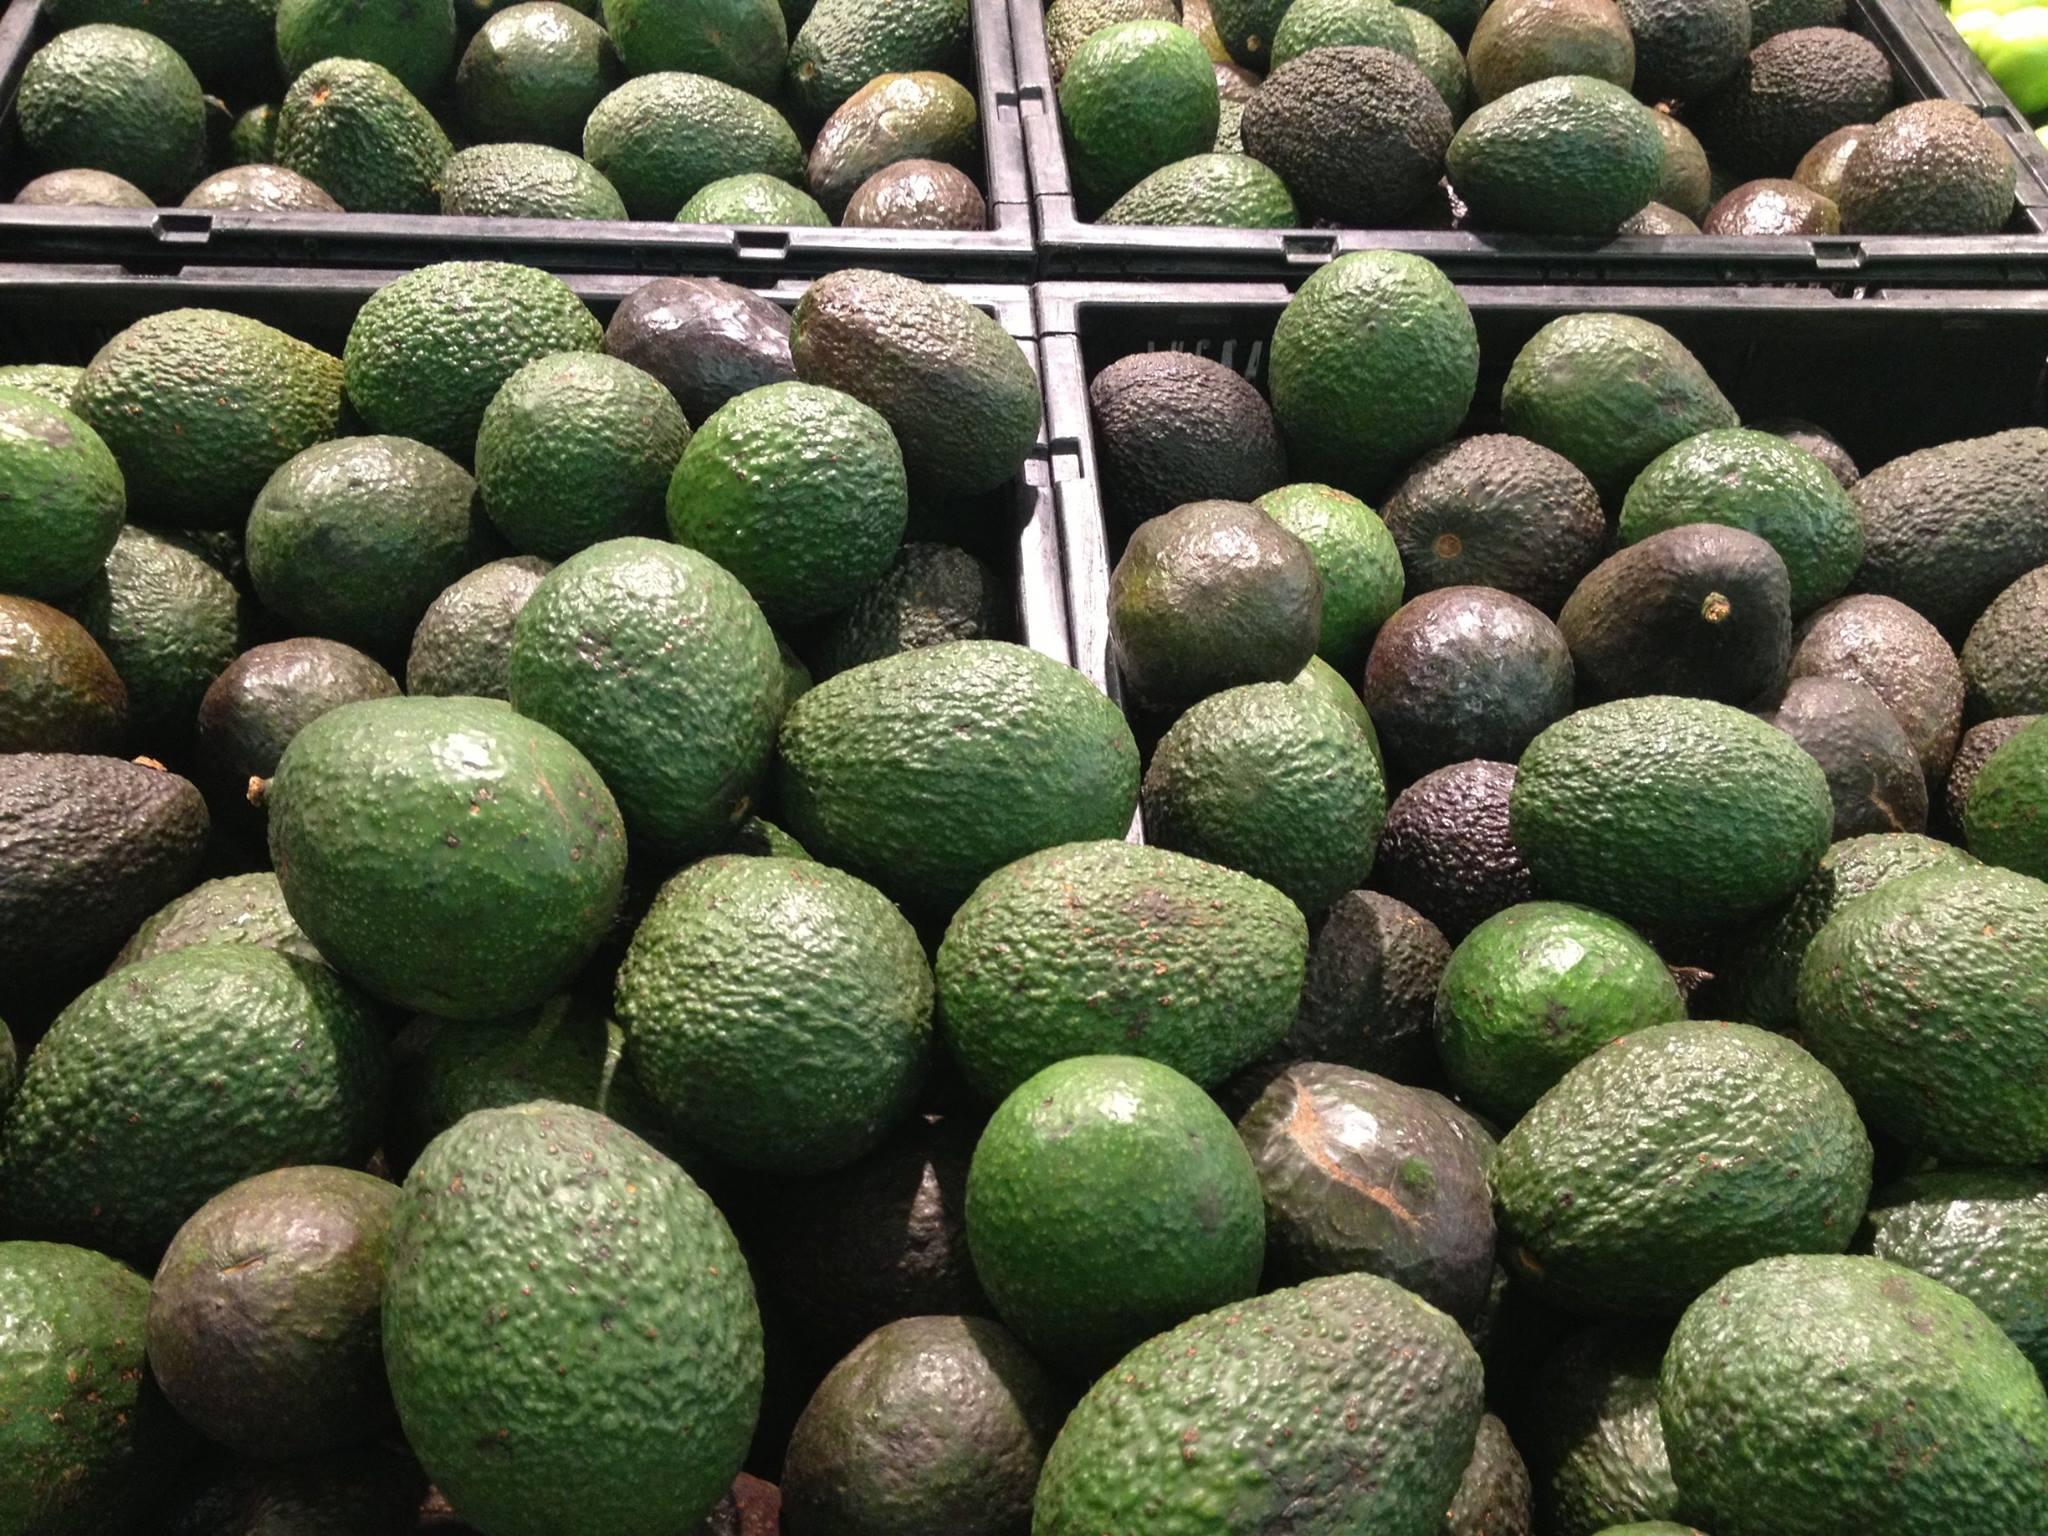 México acusa a Costa Rica ante OMC por restricciones a aguacate